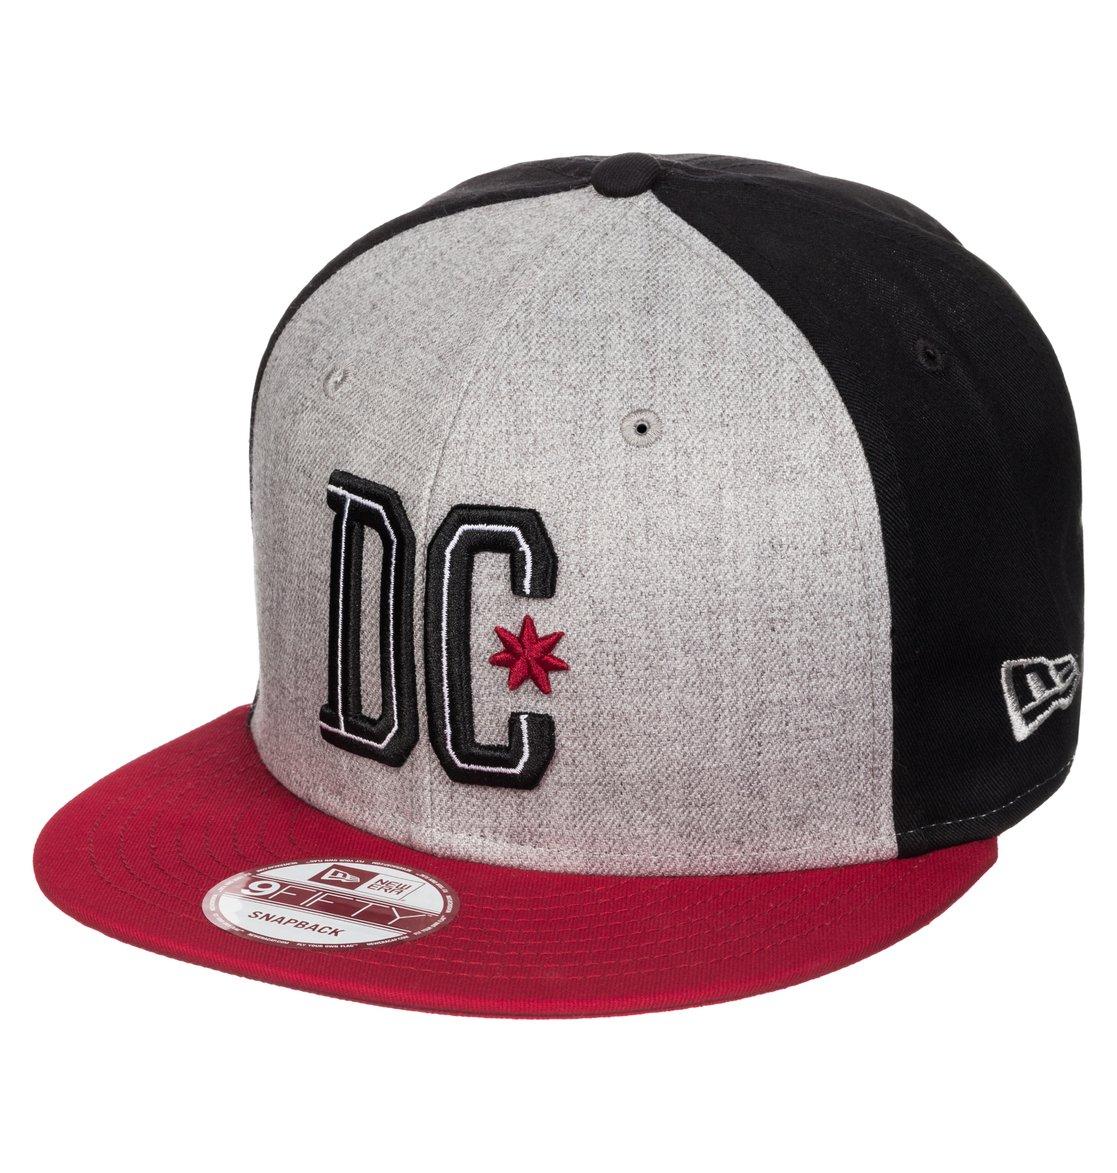 0 Men s RD Downdown Snapback New Era Hat ADYHA03220 DC Shoes 66e337ea020d